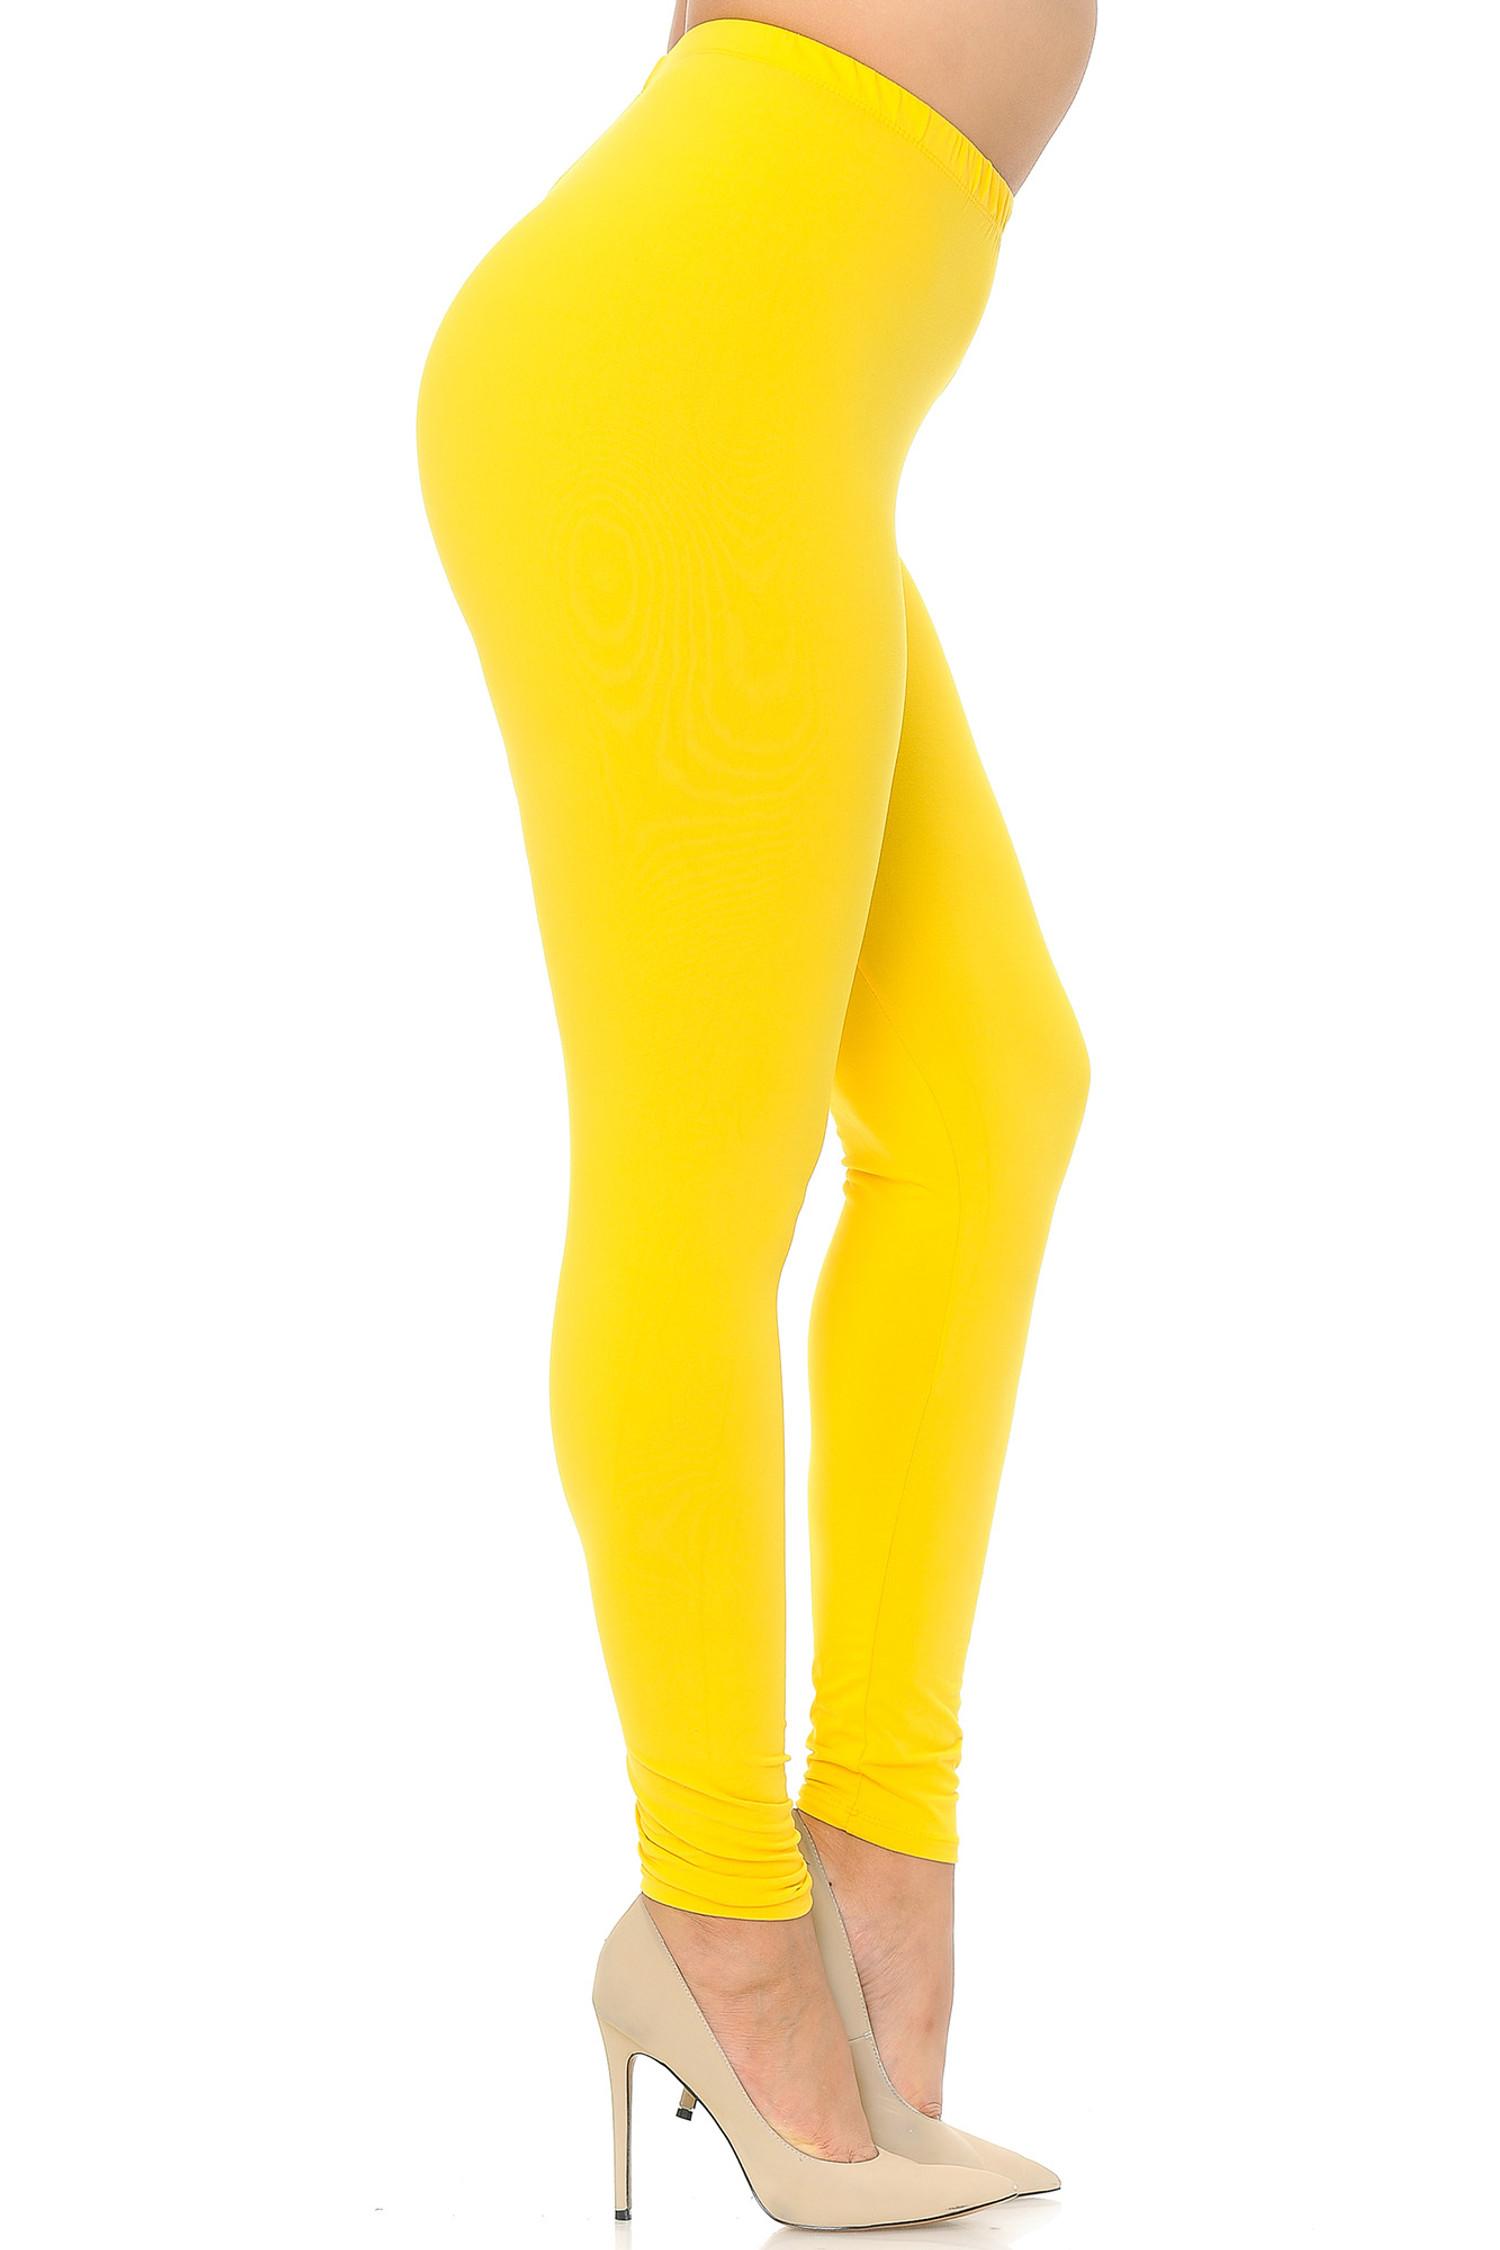 Brushed Basic Solid Extra Plus Size Leggings - 3X-5X - EEVEE